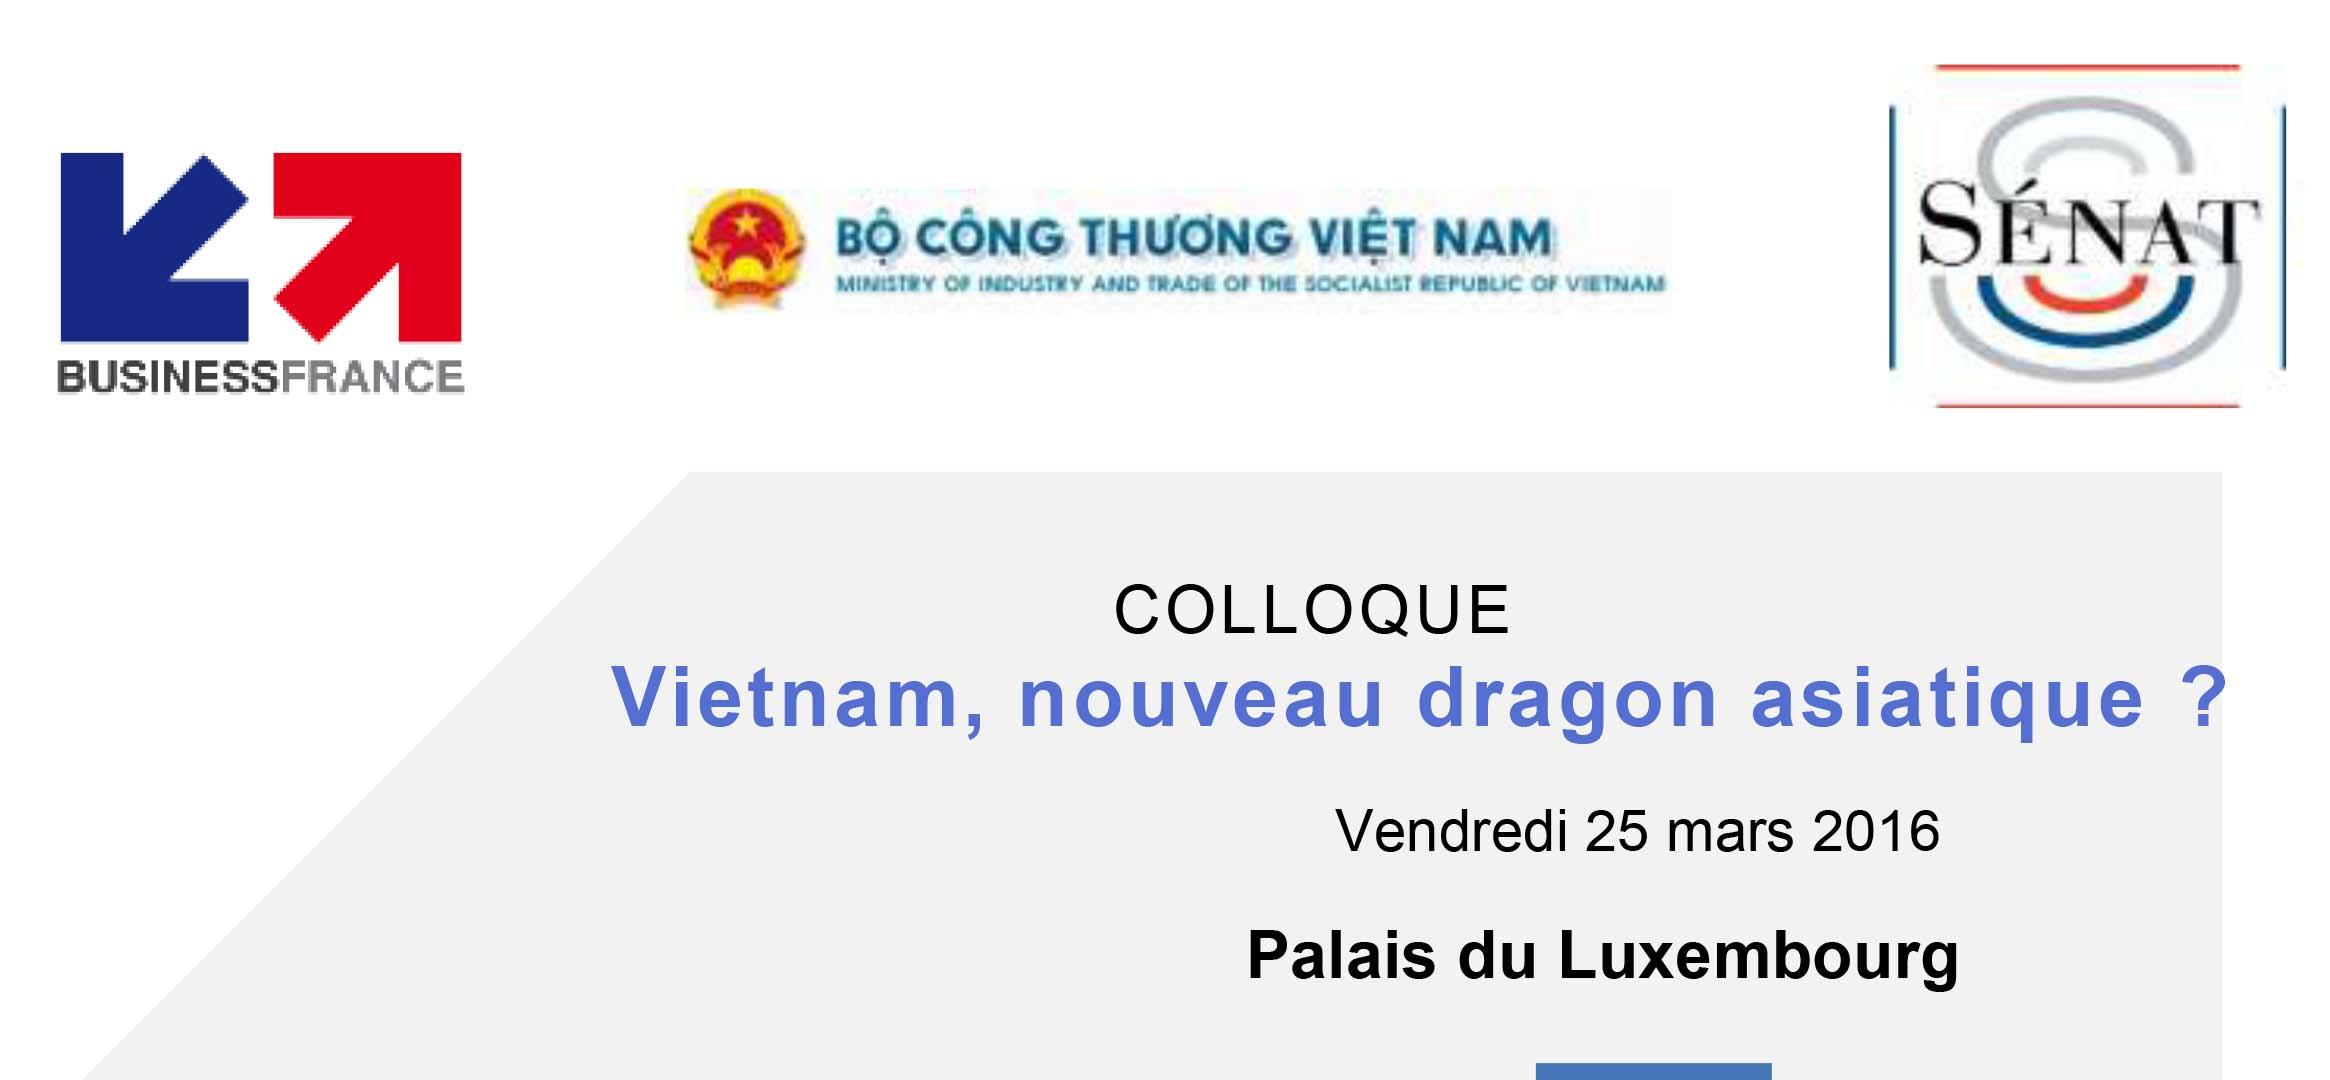 vignette_colloque_vietnam.jpg